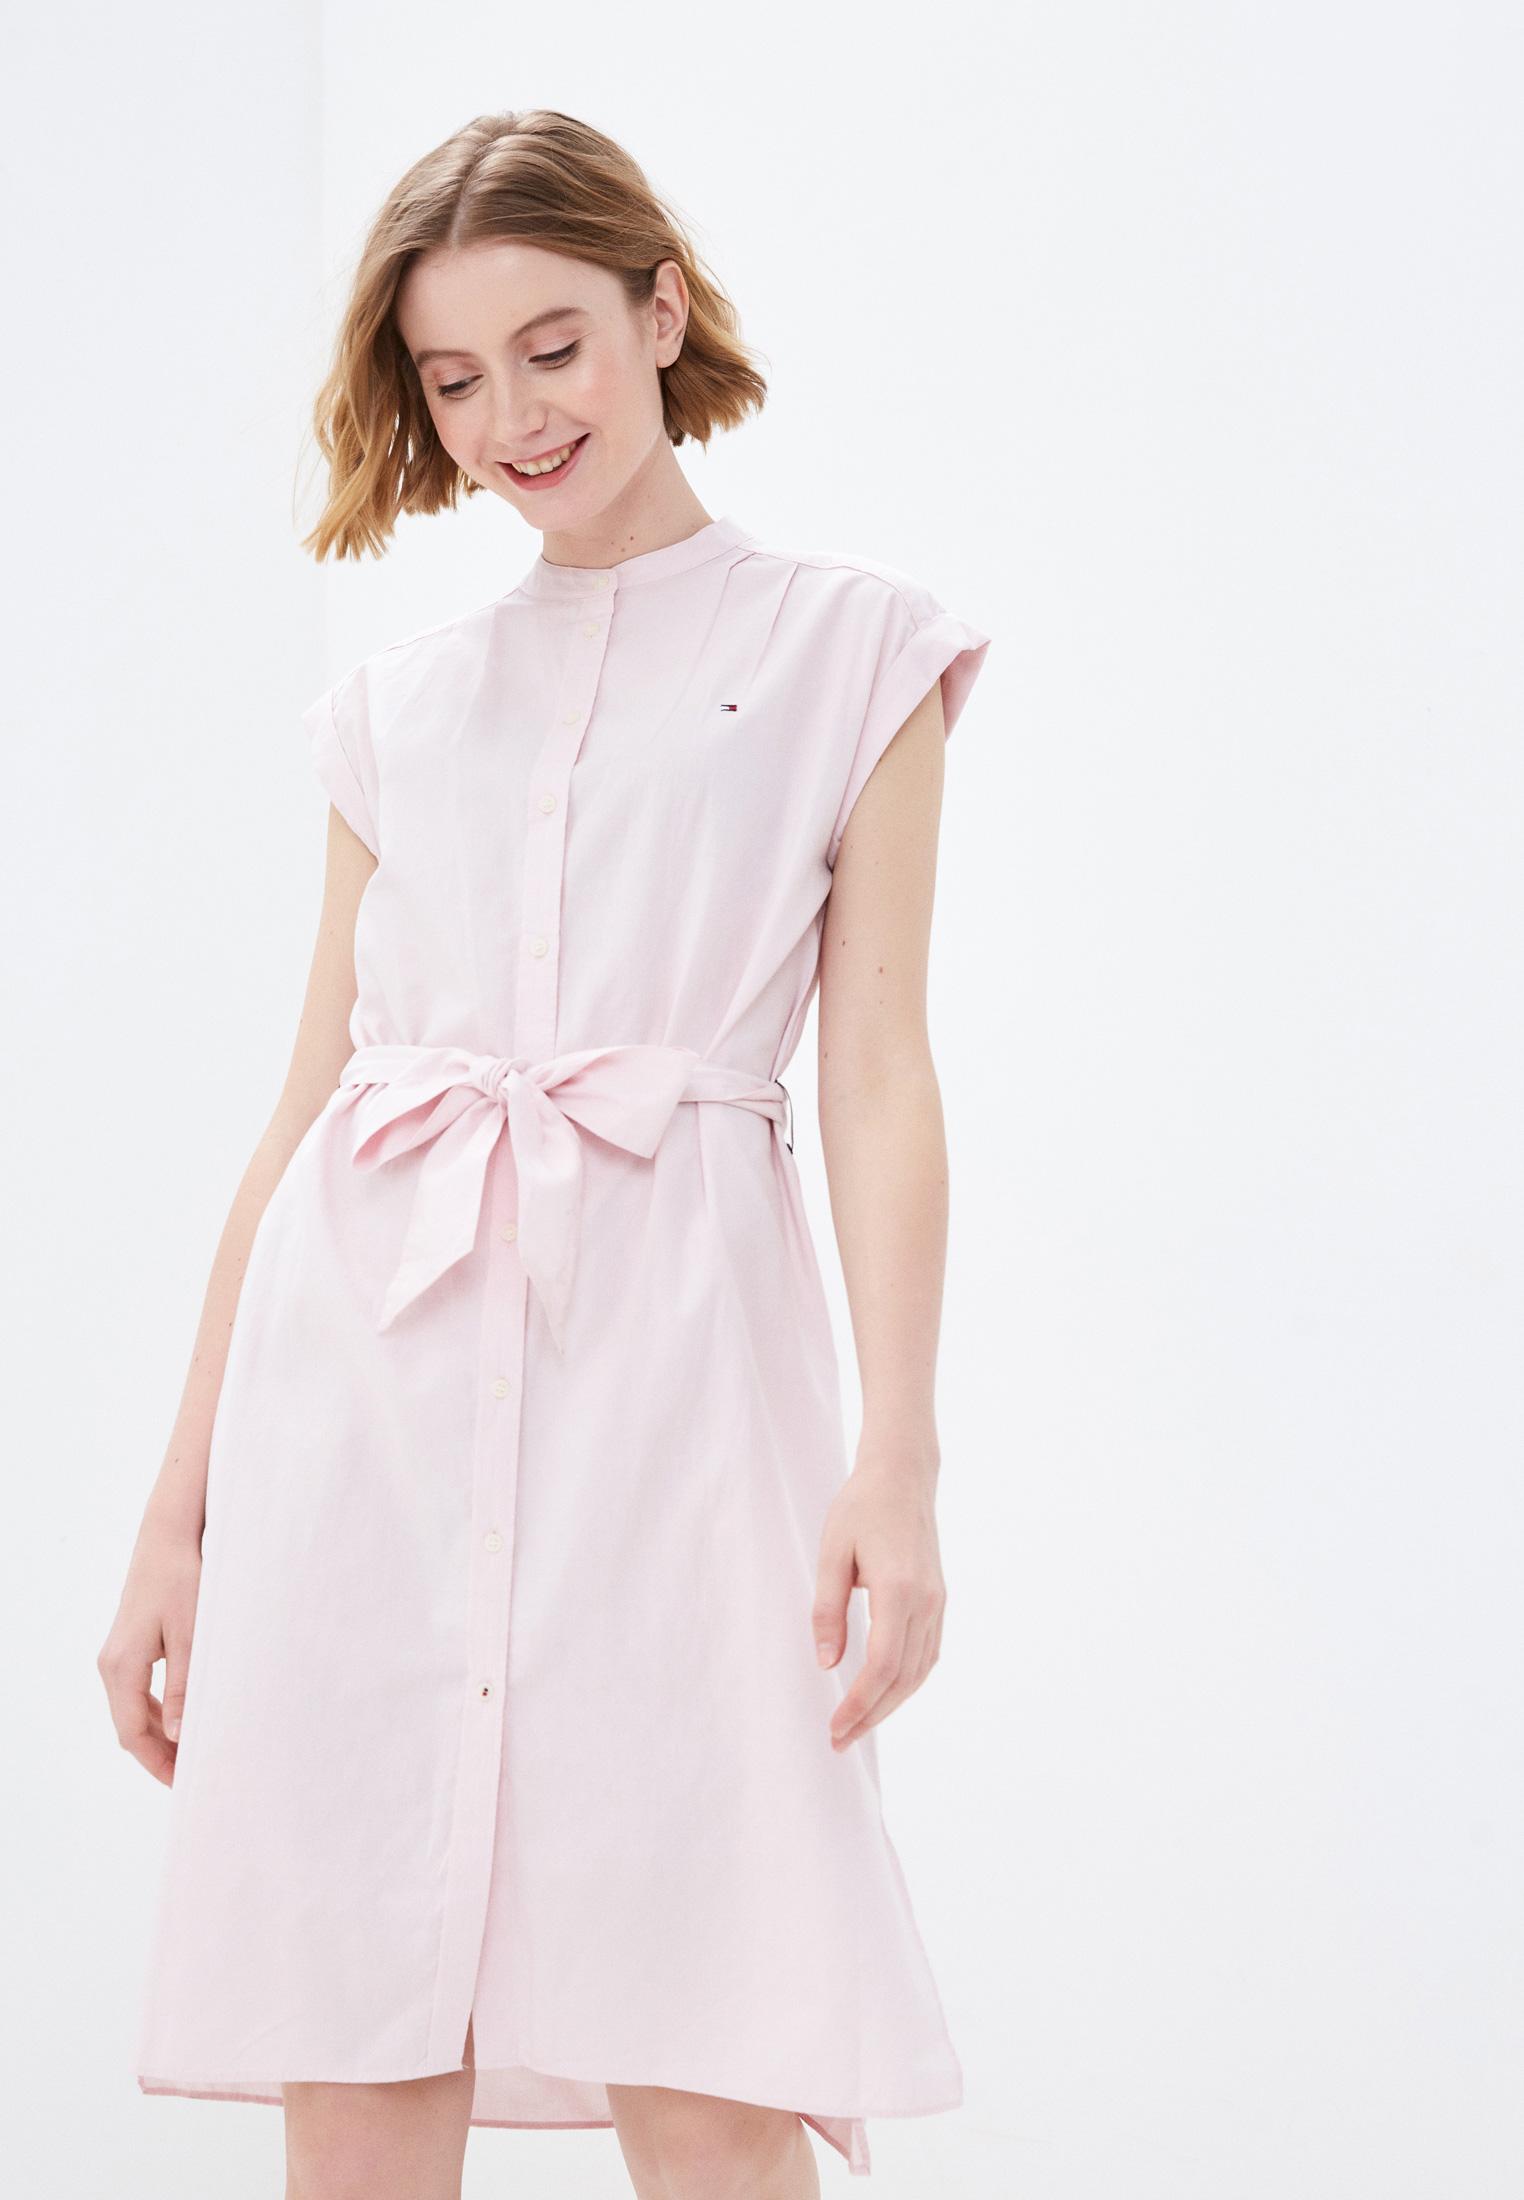 Платье Tommy Hilfiger (Томми Хилфигер) WW0WW30596: изображение 1